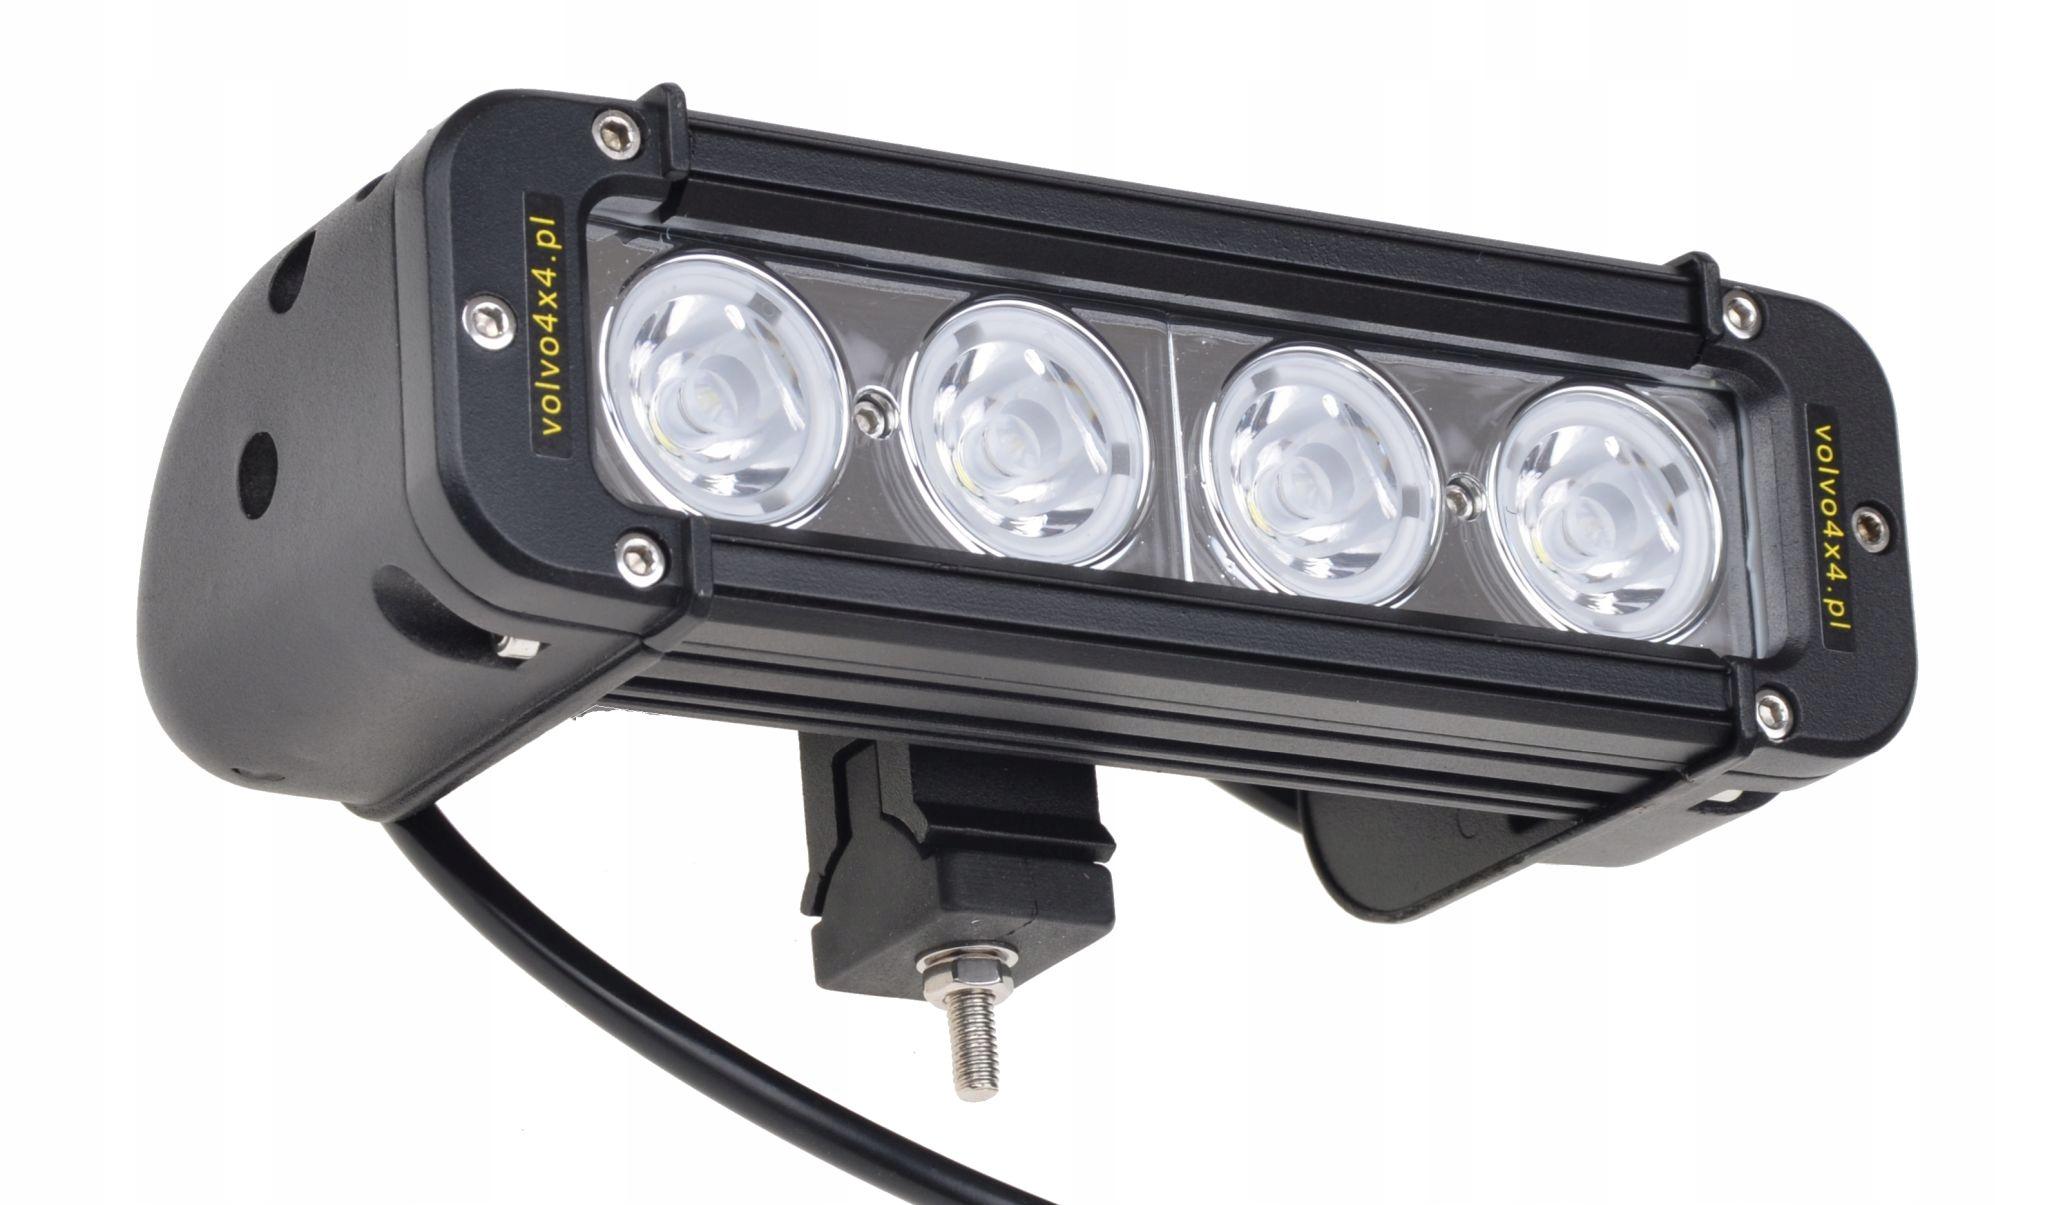 галоген дальнего света 40w 4x led панель 4x4 off-road